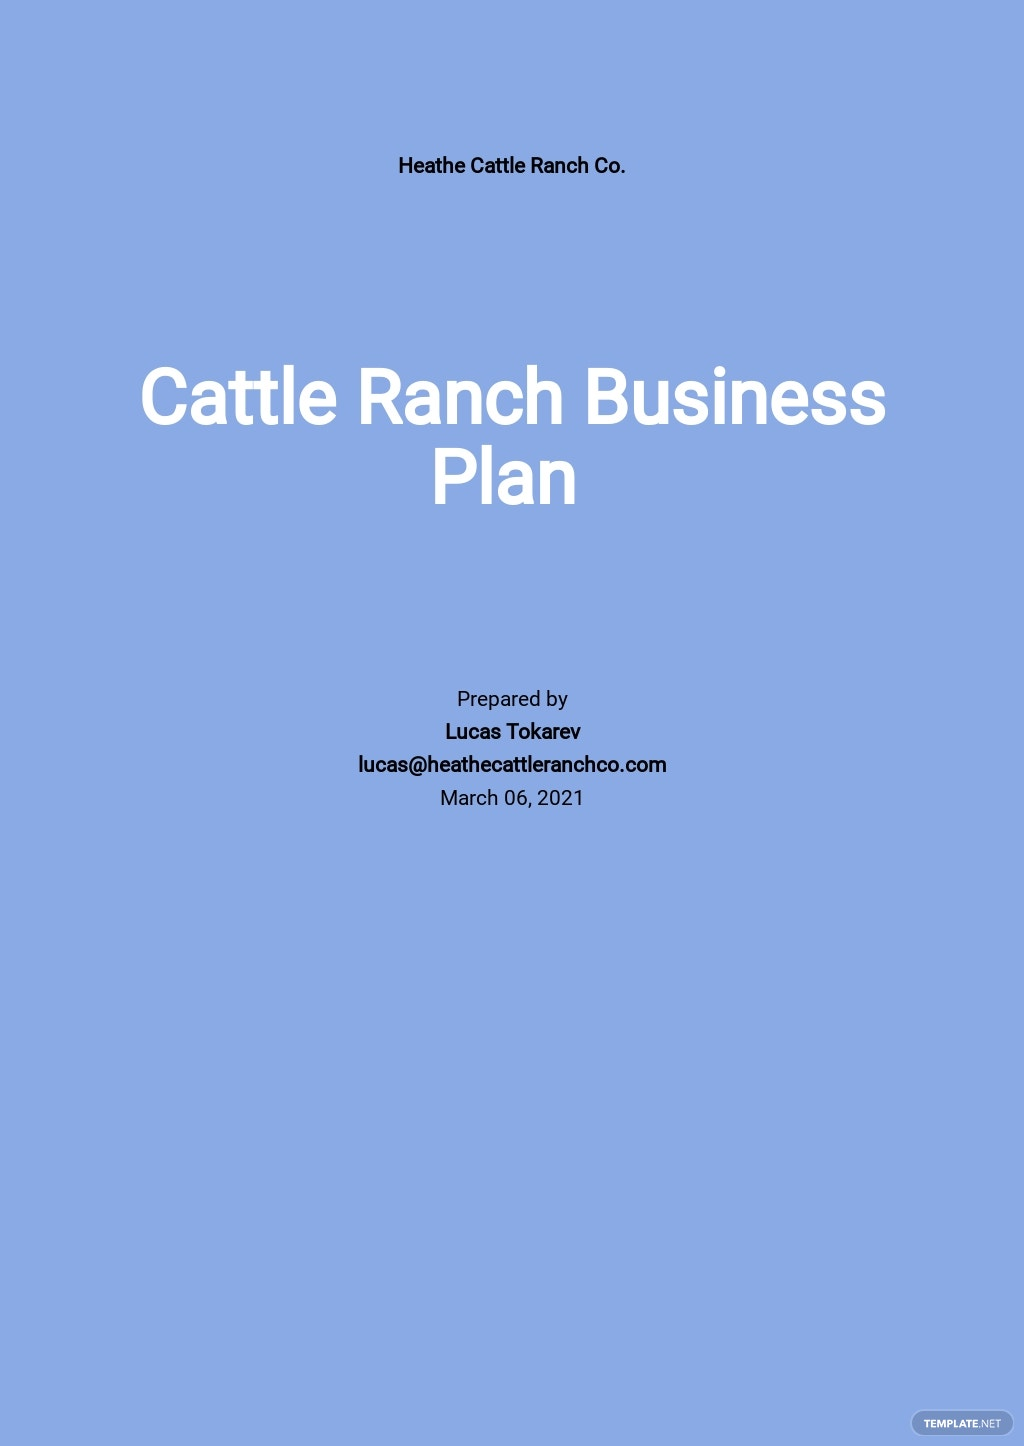 Cattle Ranch Business Plan Template